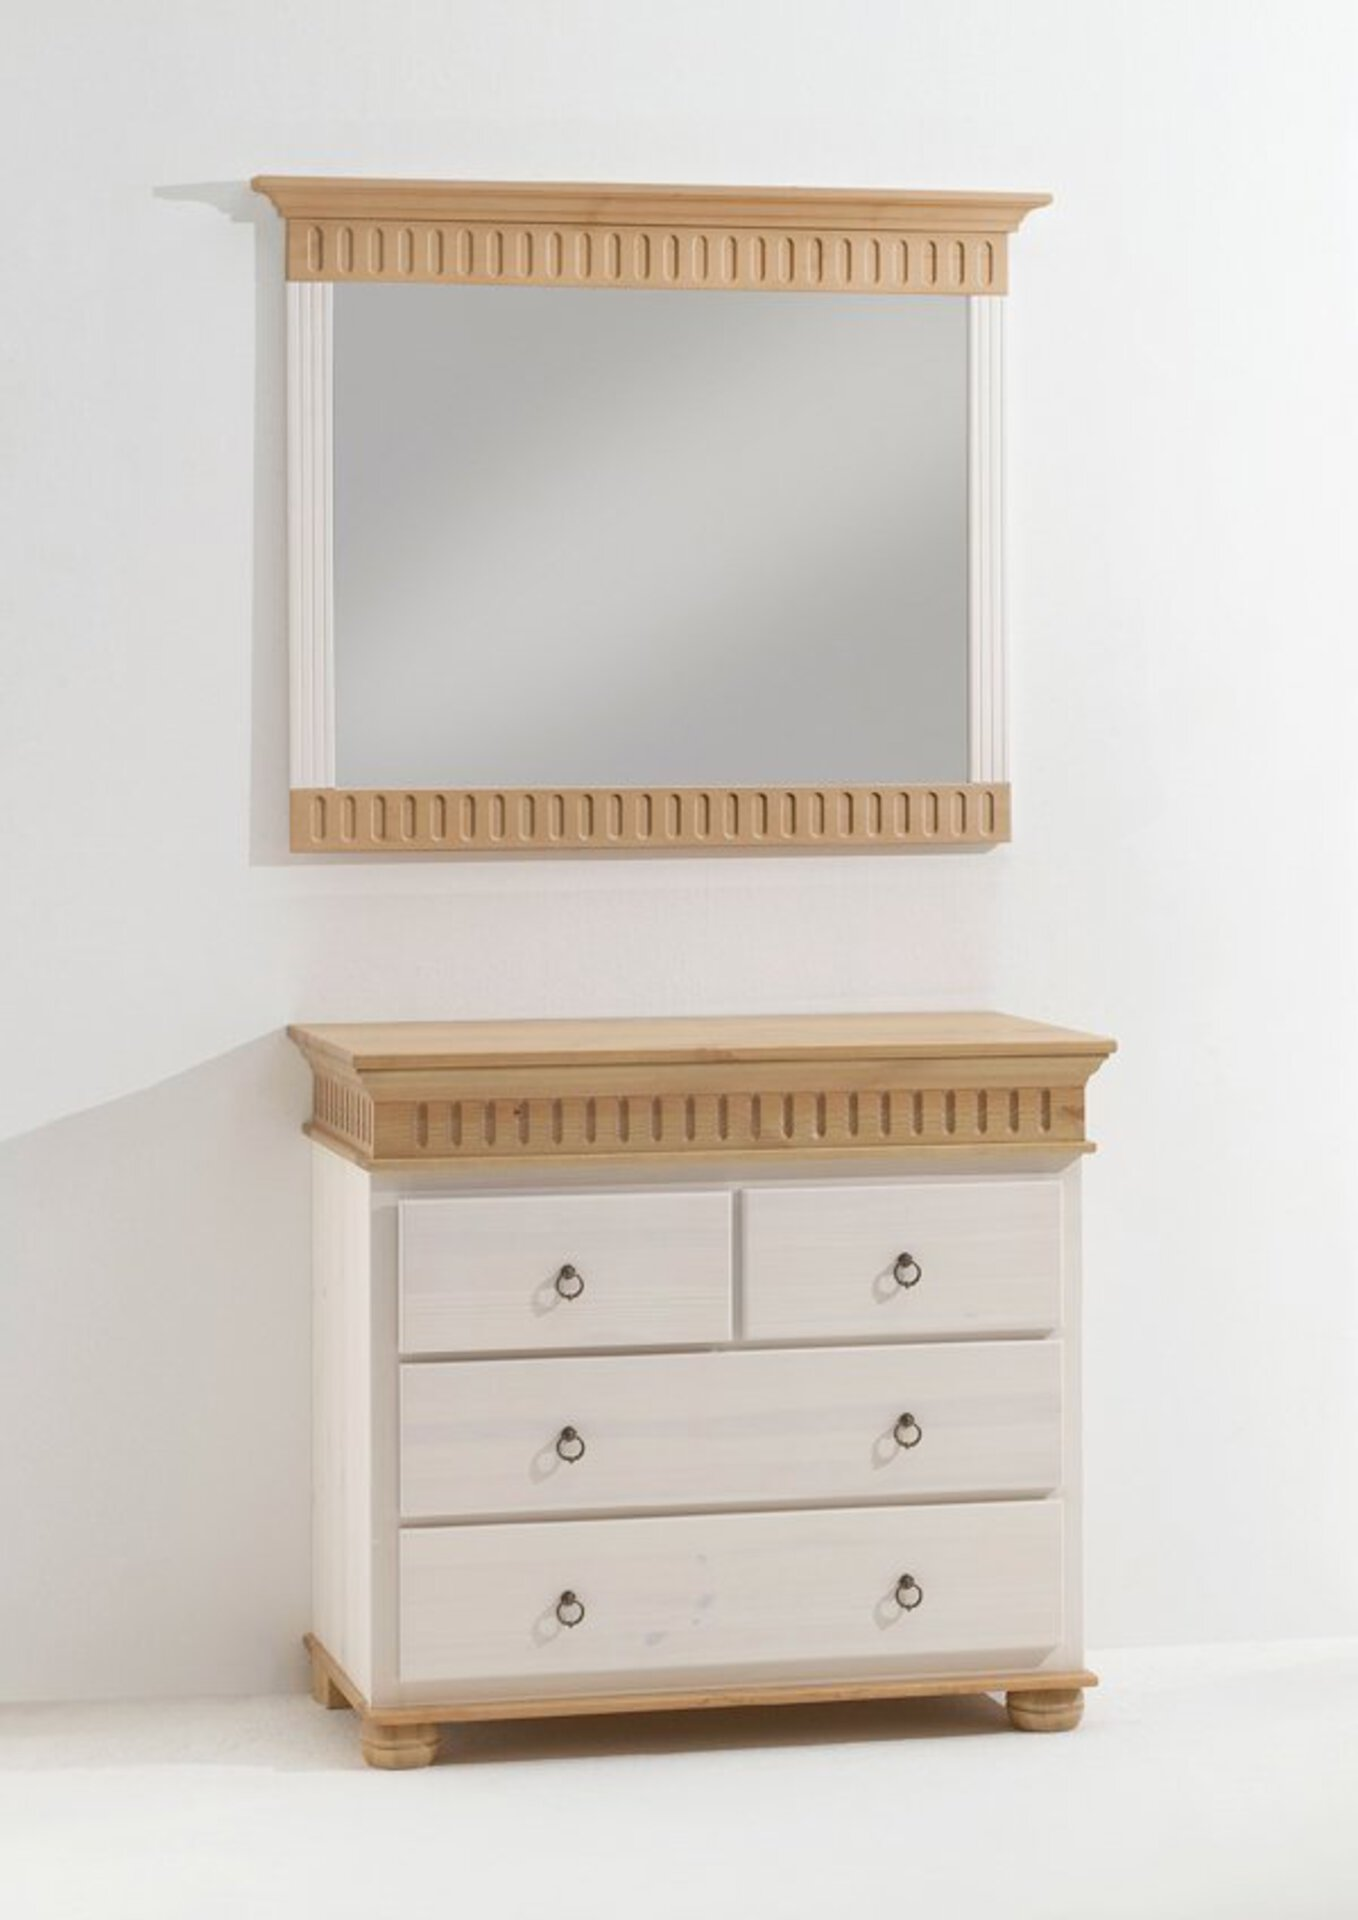 Spiegel HELSINKI Dreamoro Holzwerkstoff weiß 7 x 86 x 105 cm